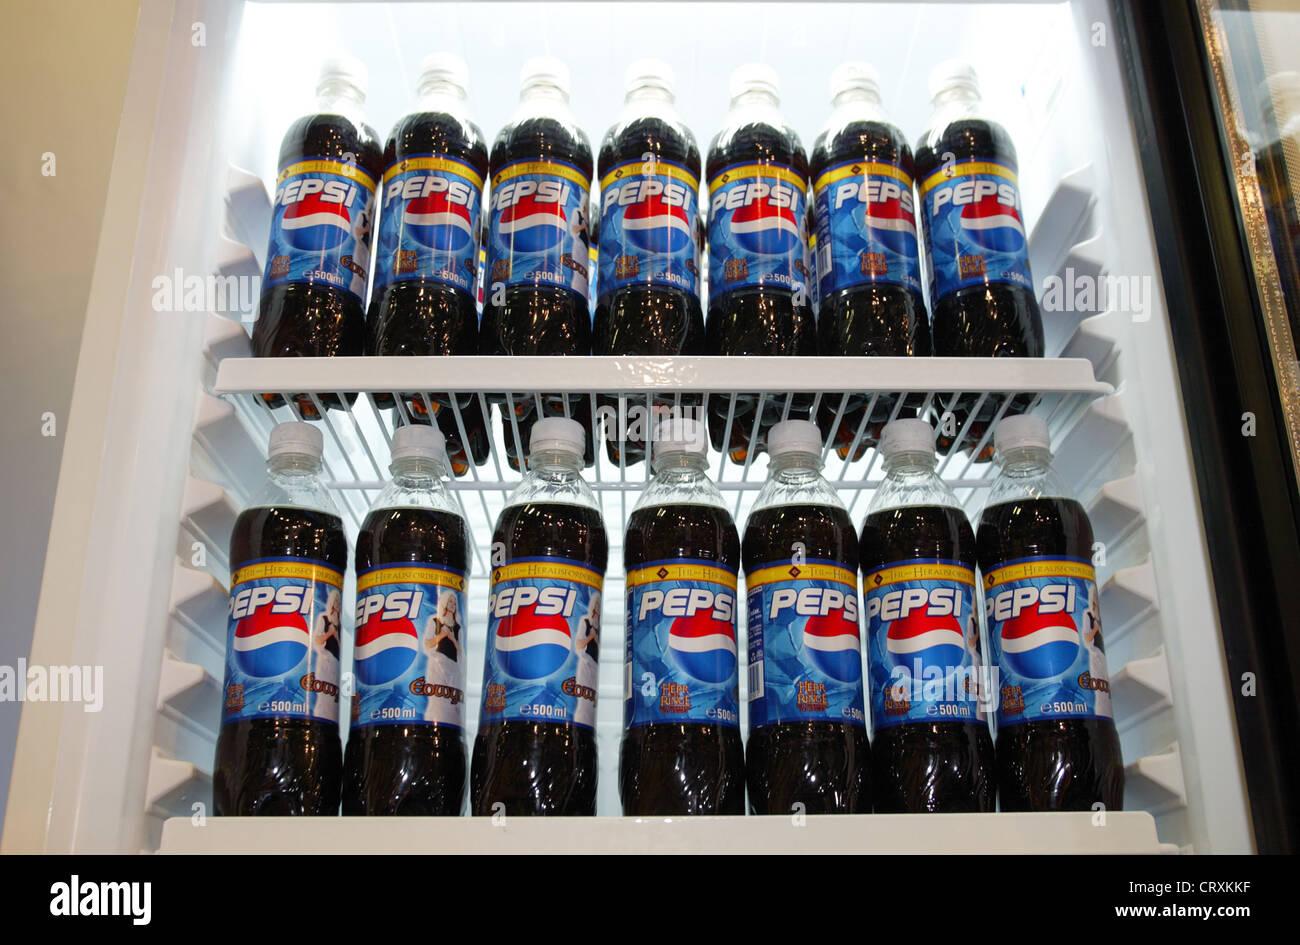 Mini Kühlschrank Pepsi : Pepsi cola unternehmen stockfotos pepsi cola unternehmen bilder